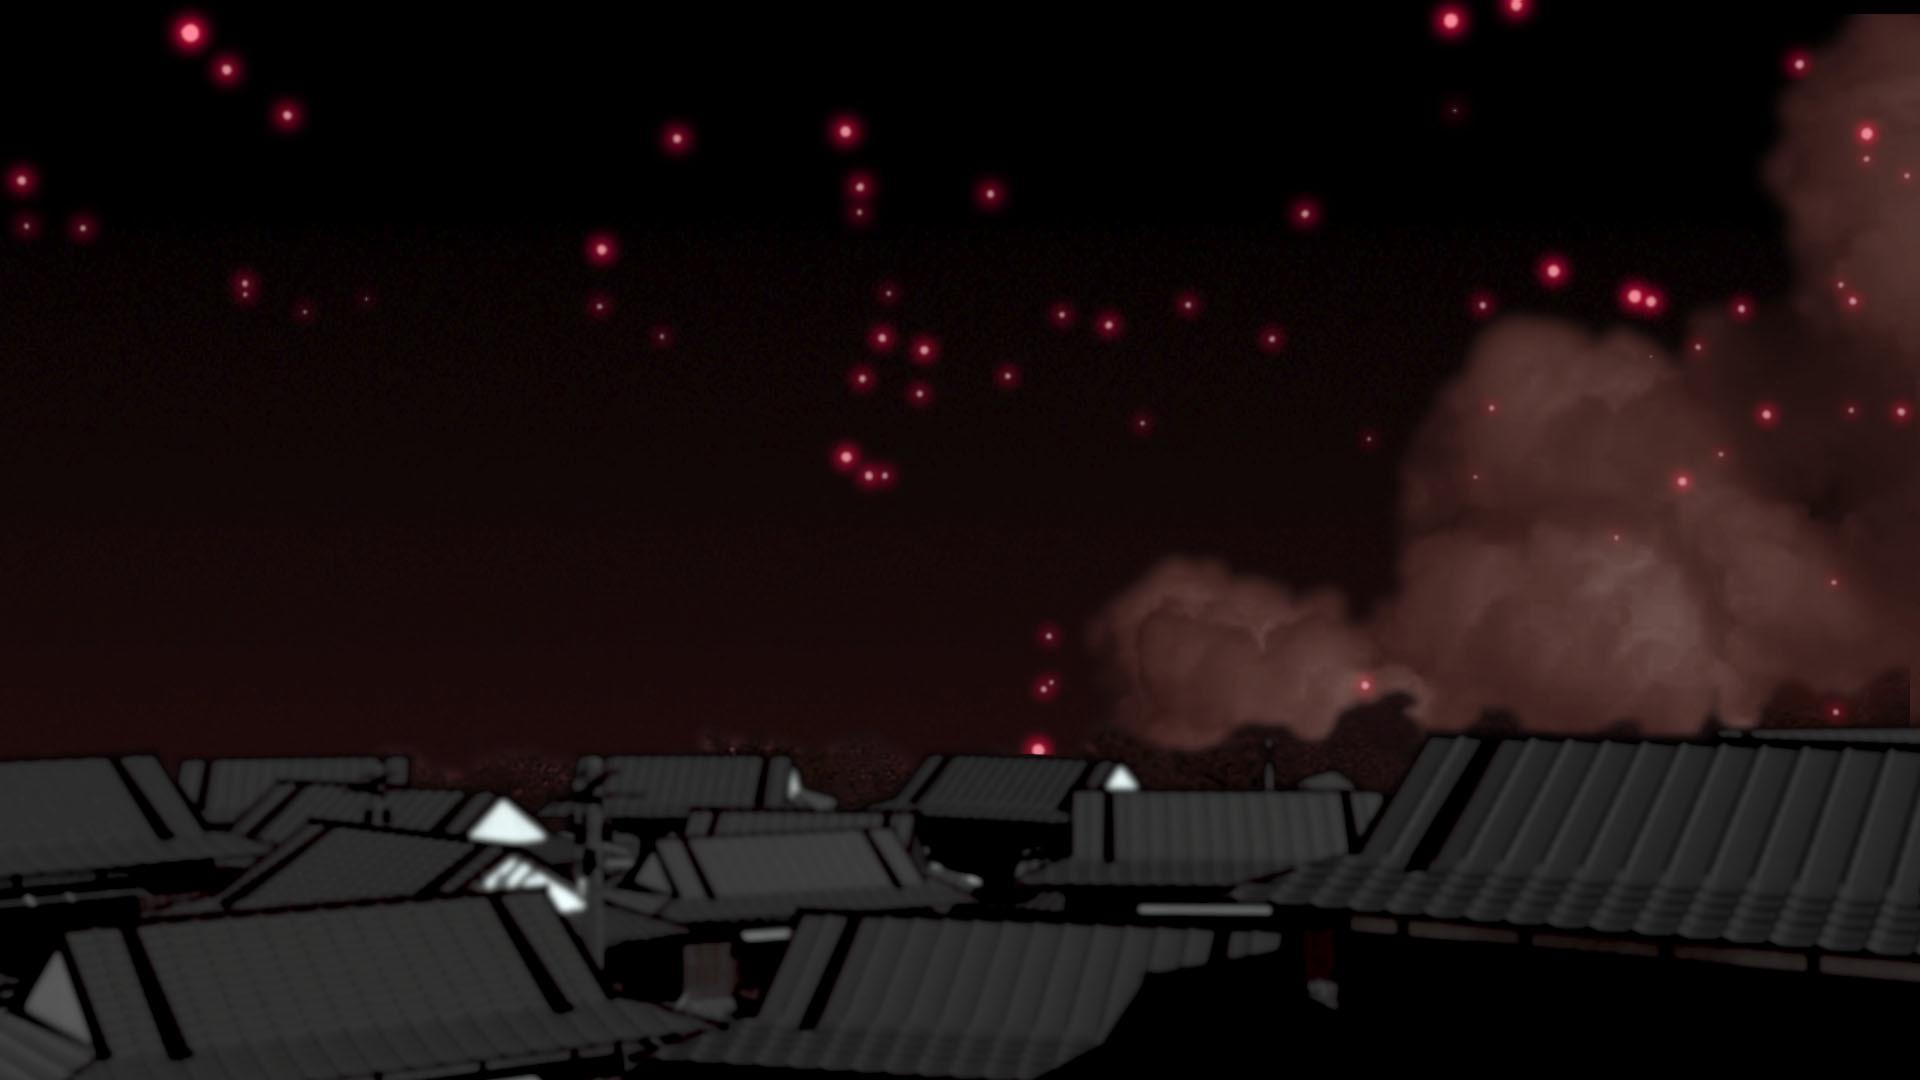 Viraj Nayee Grave Of The Fireflies Fan Made Trailer